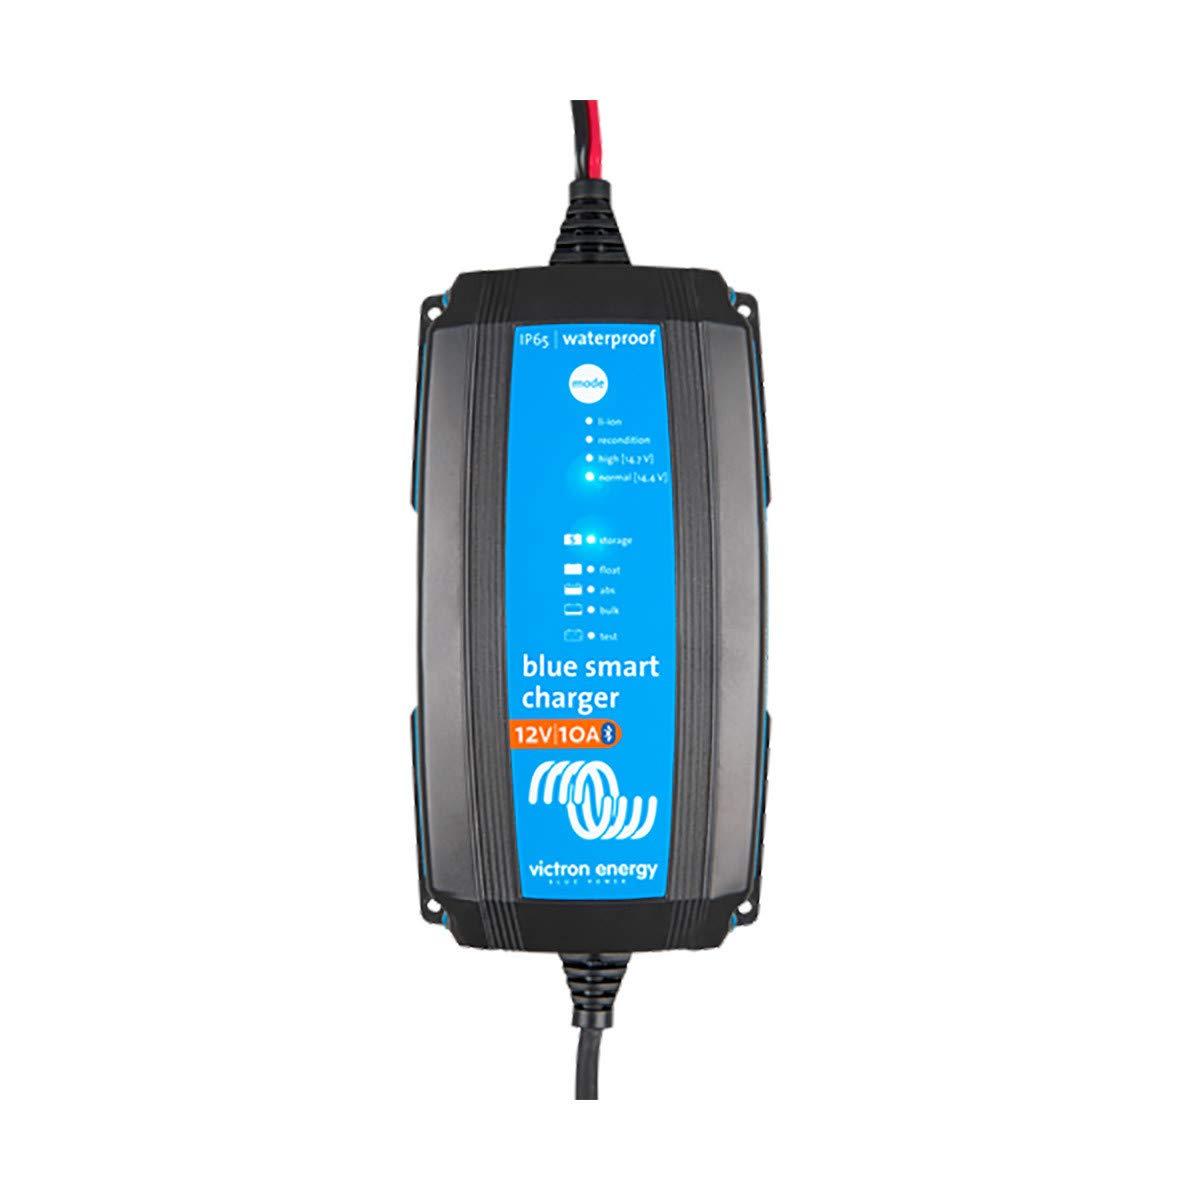 Victron BlueSmart Batterieladeger/ät IP65 12//7 mit integriertem Bluetooth f/ür alle Batterietypen 12V 7A BPC120731064R